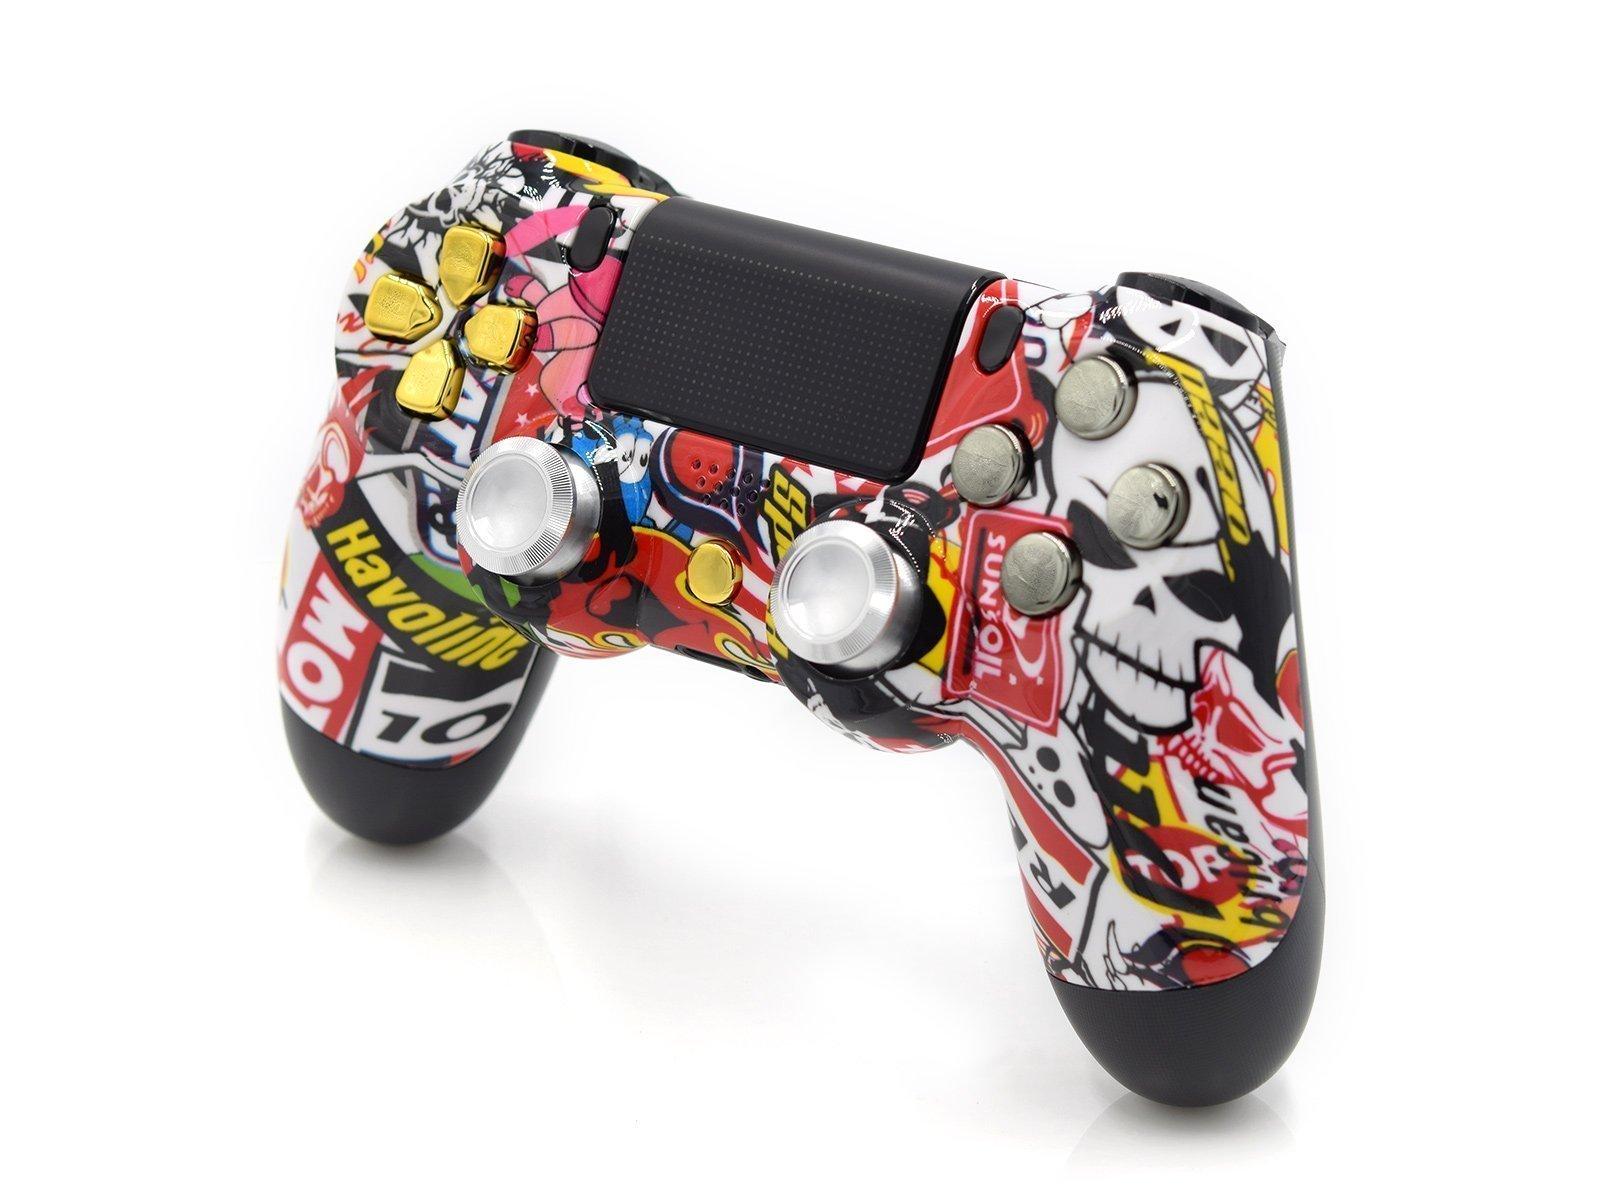 Sticker Bomb PlayStation 4 Custom Controller